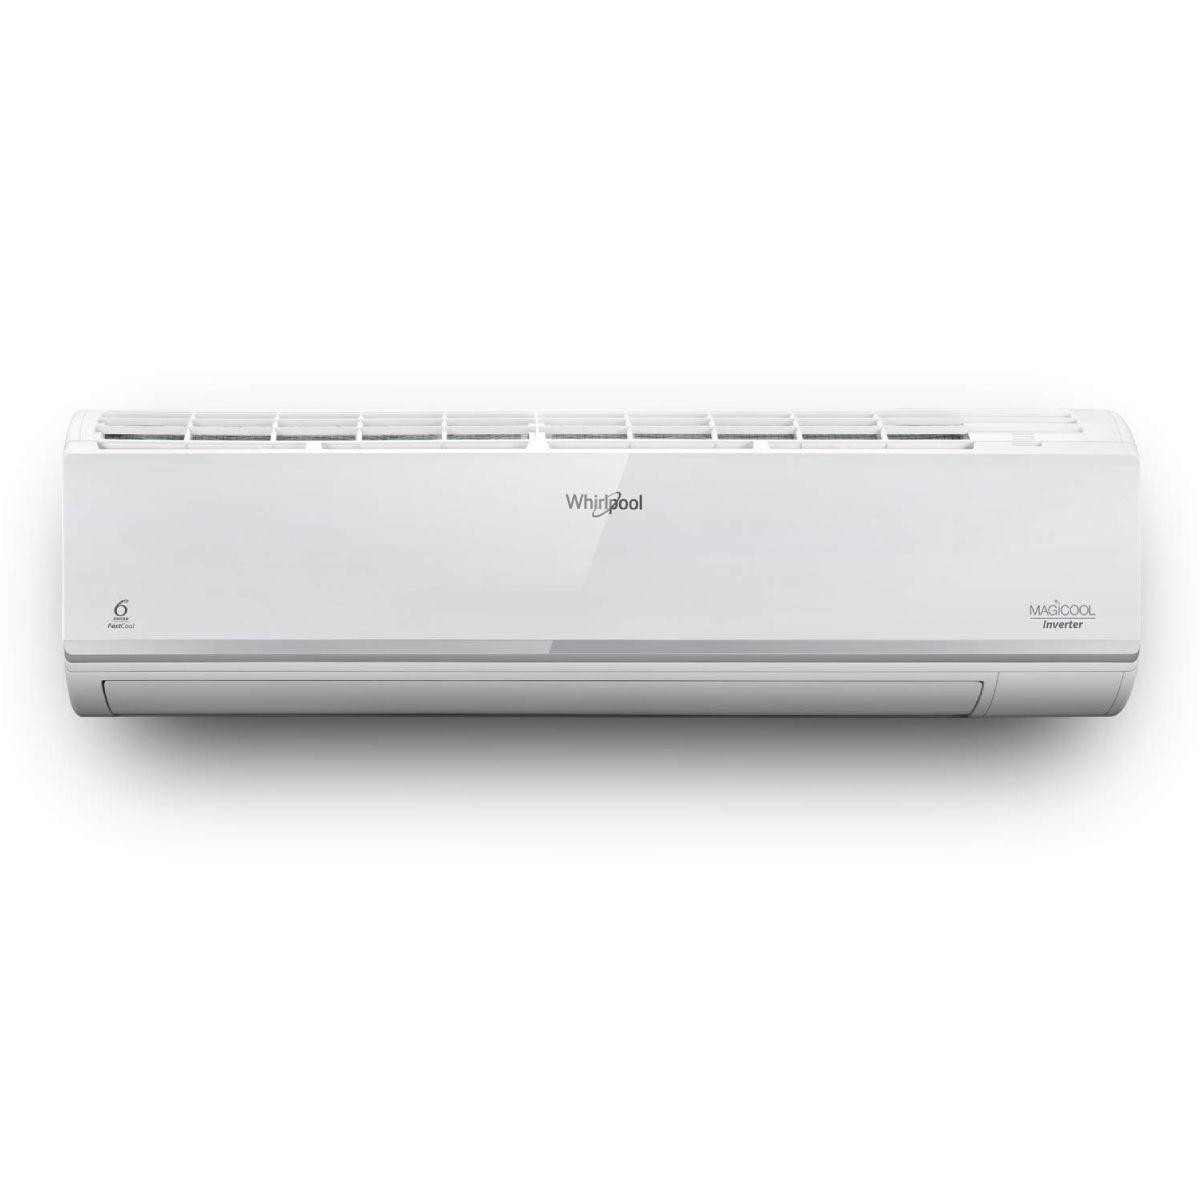 Whirlpool 1.5 Ton 3 Star Inverter Split AC (1.5T MAGICOOL 3S COPR INV)